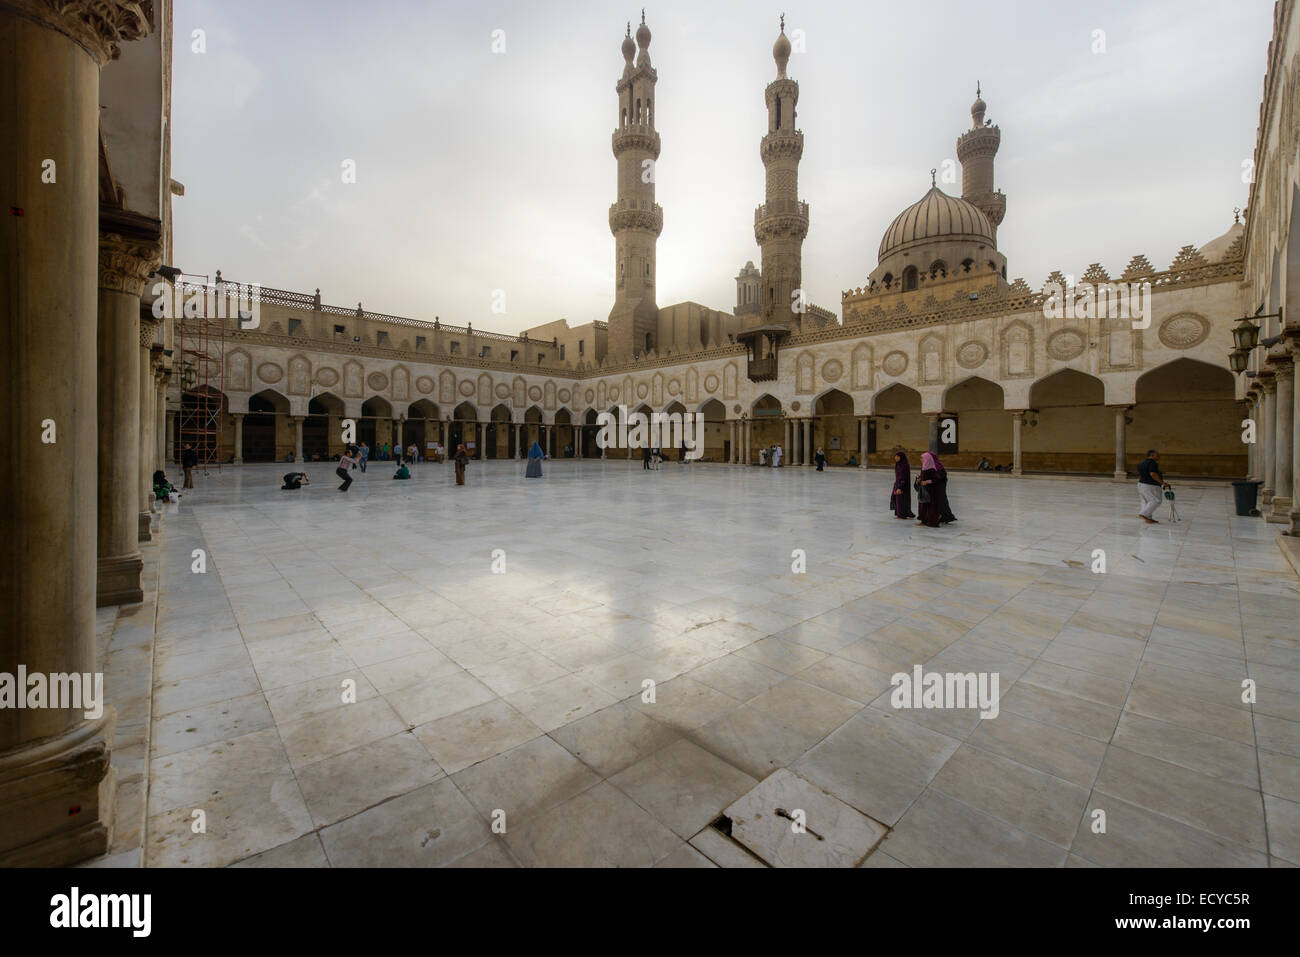 Mezquita de Al-Azhar de El Cairo islámico, Egipto Imagen De Stock